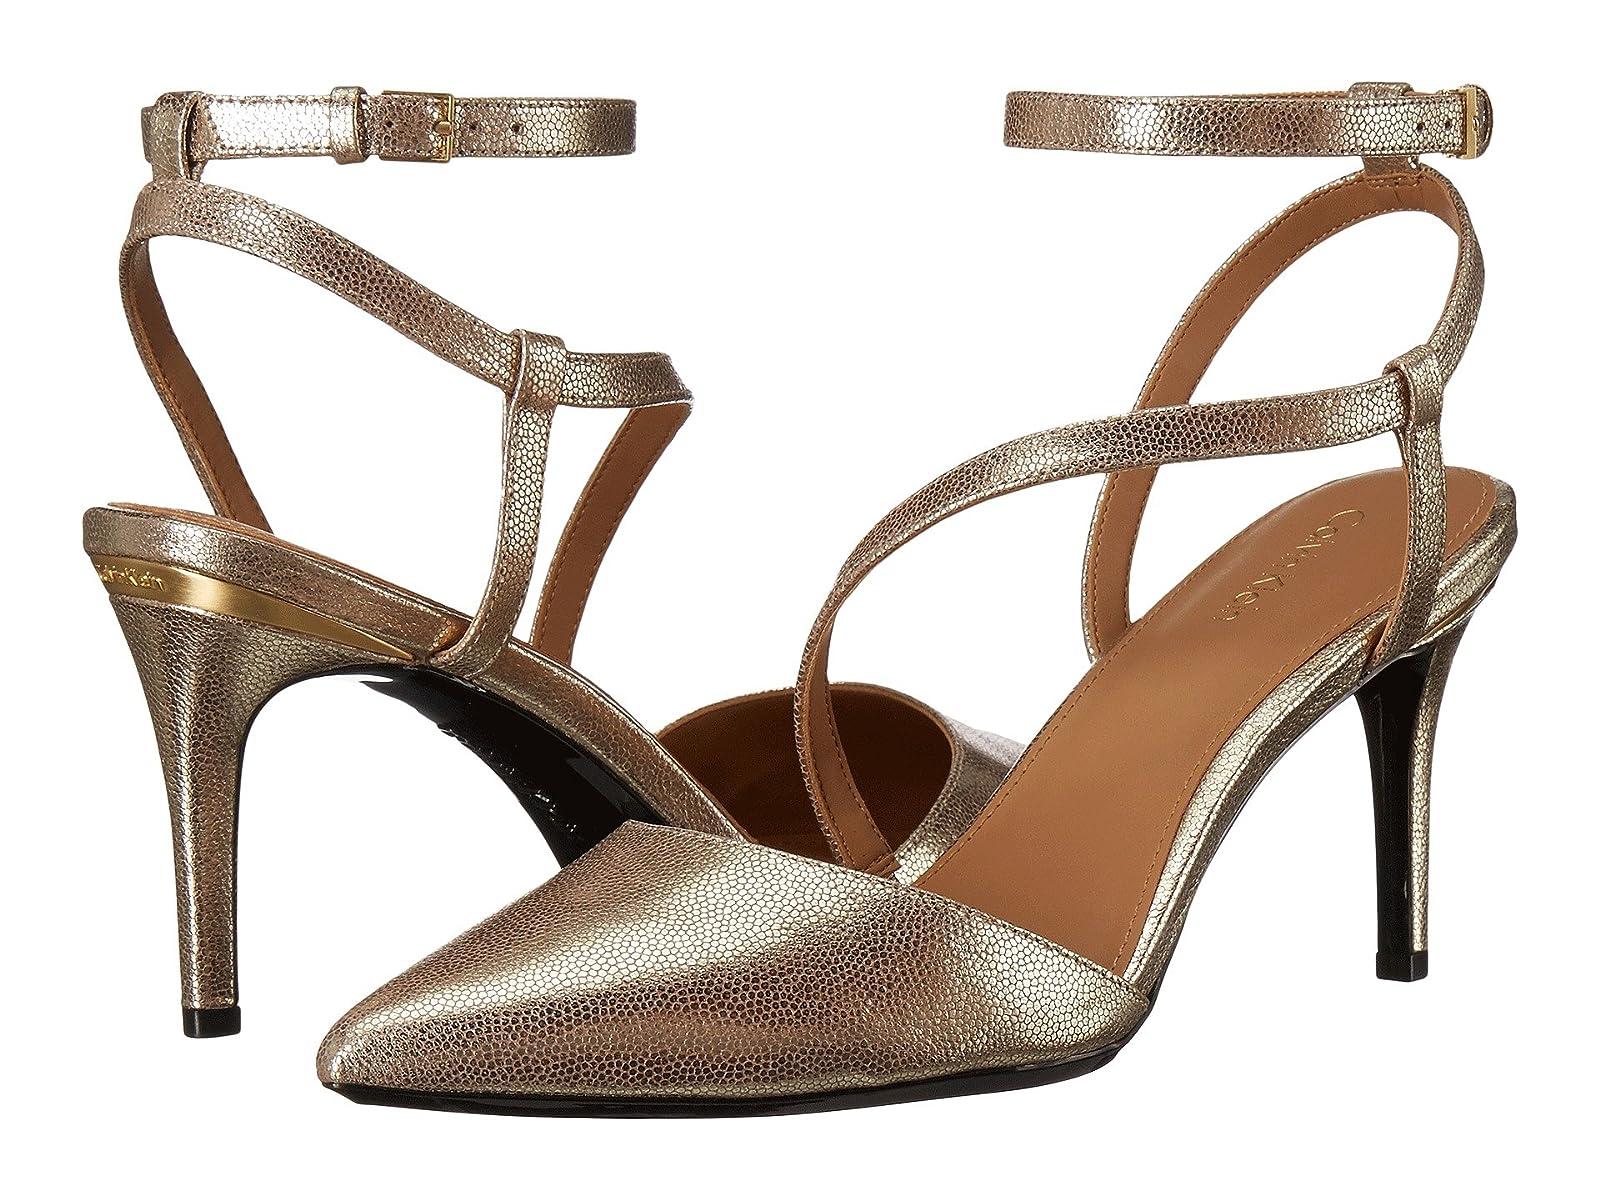 Calvin Klein GanyaCheap and distinctive eye-catching shoes